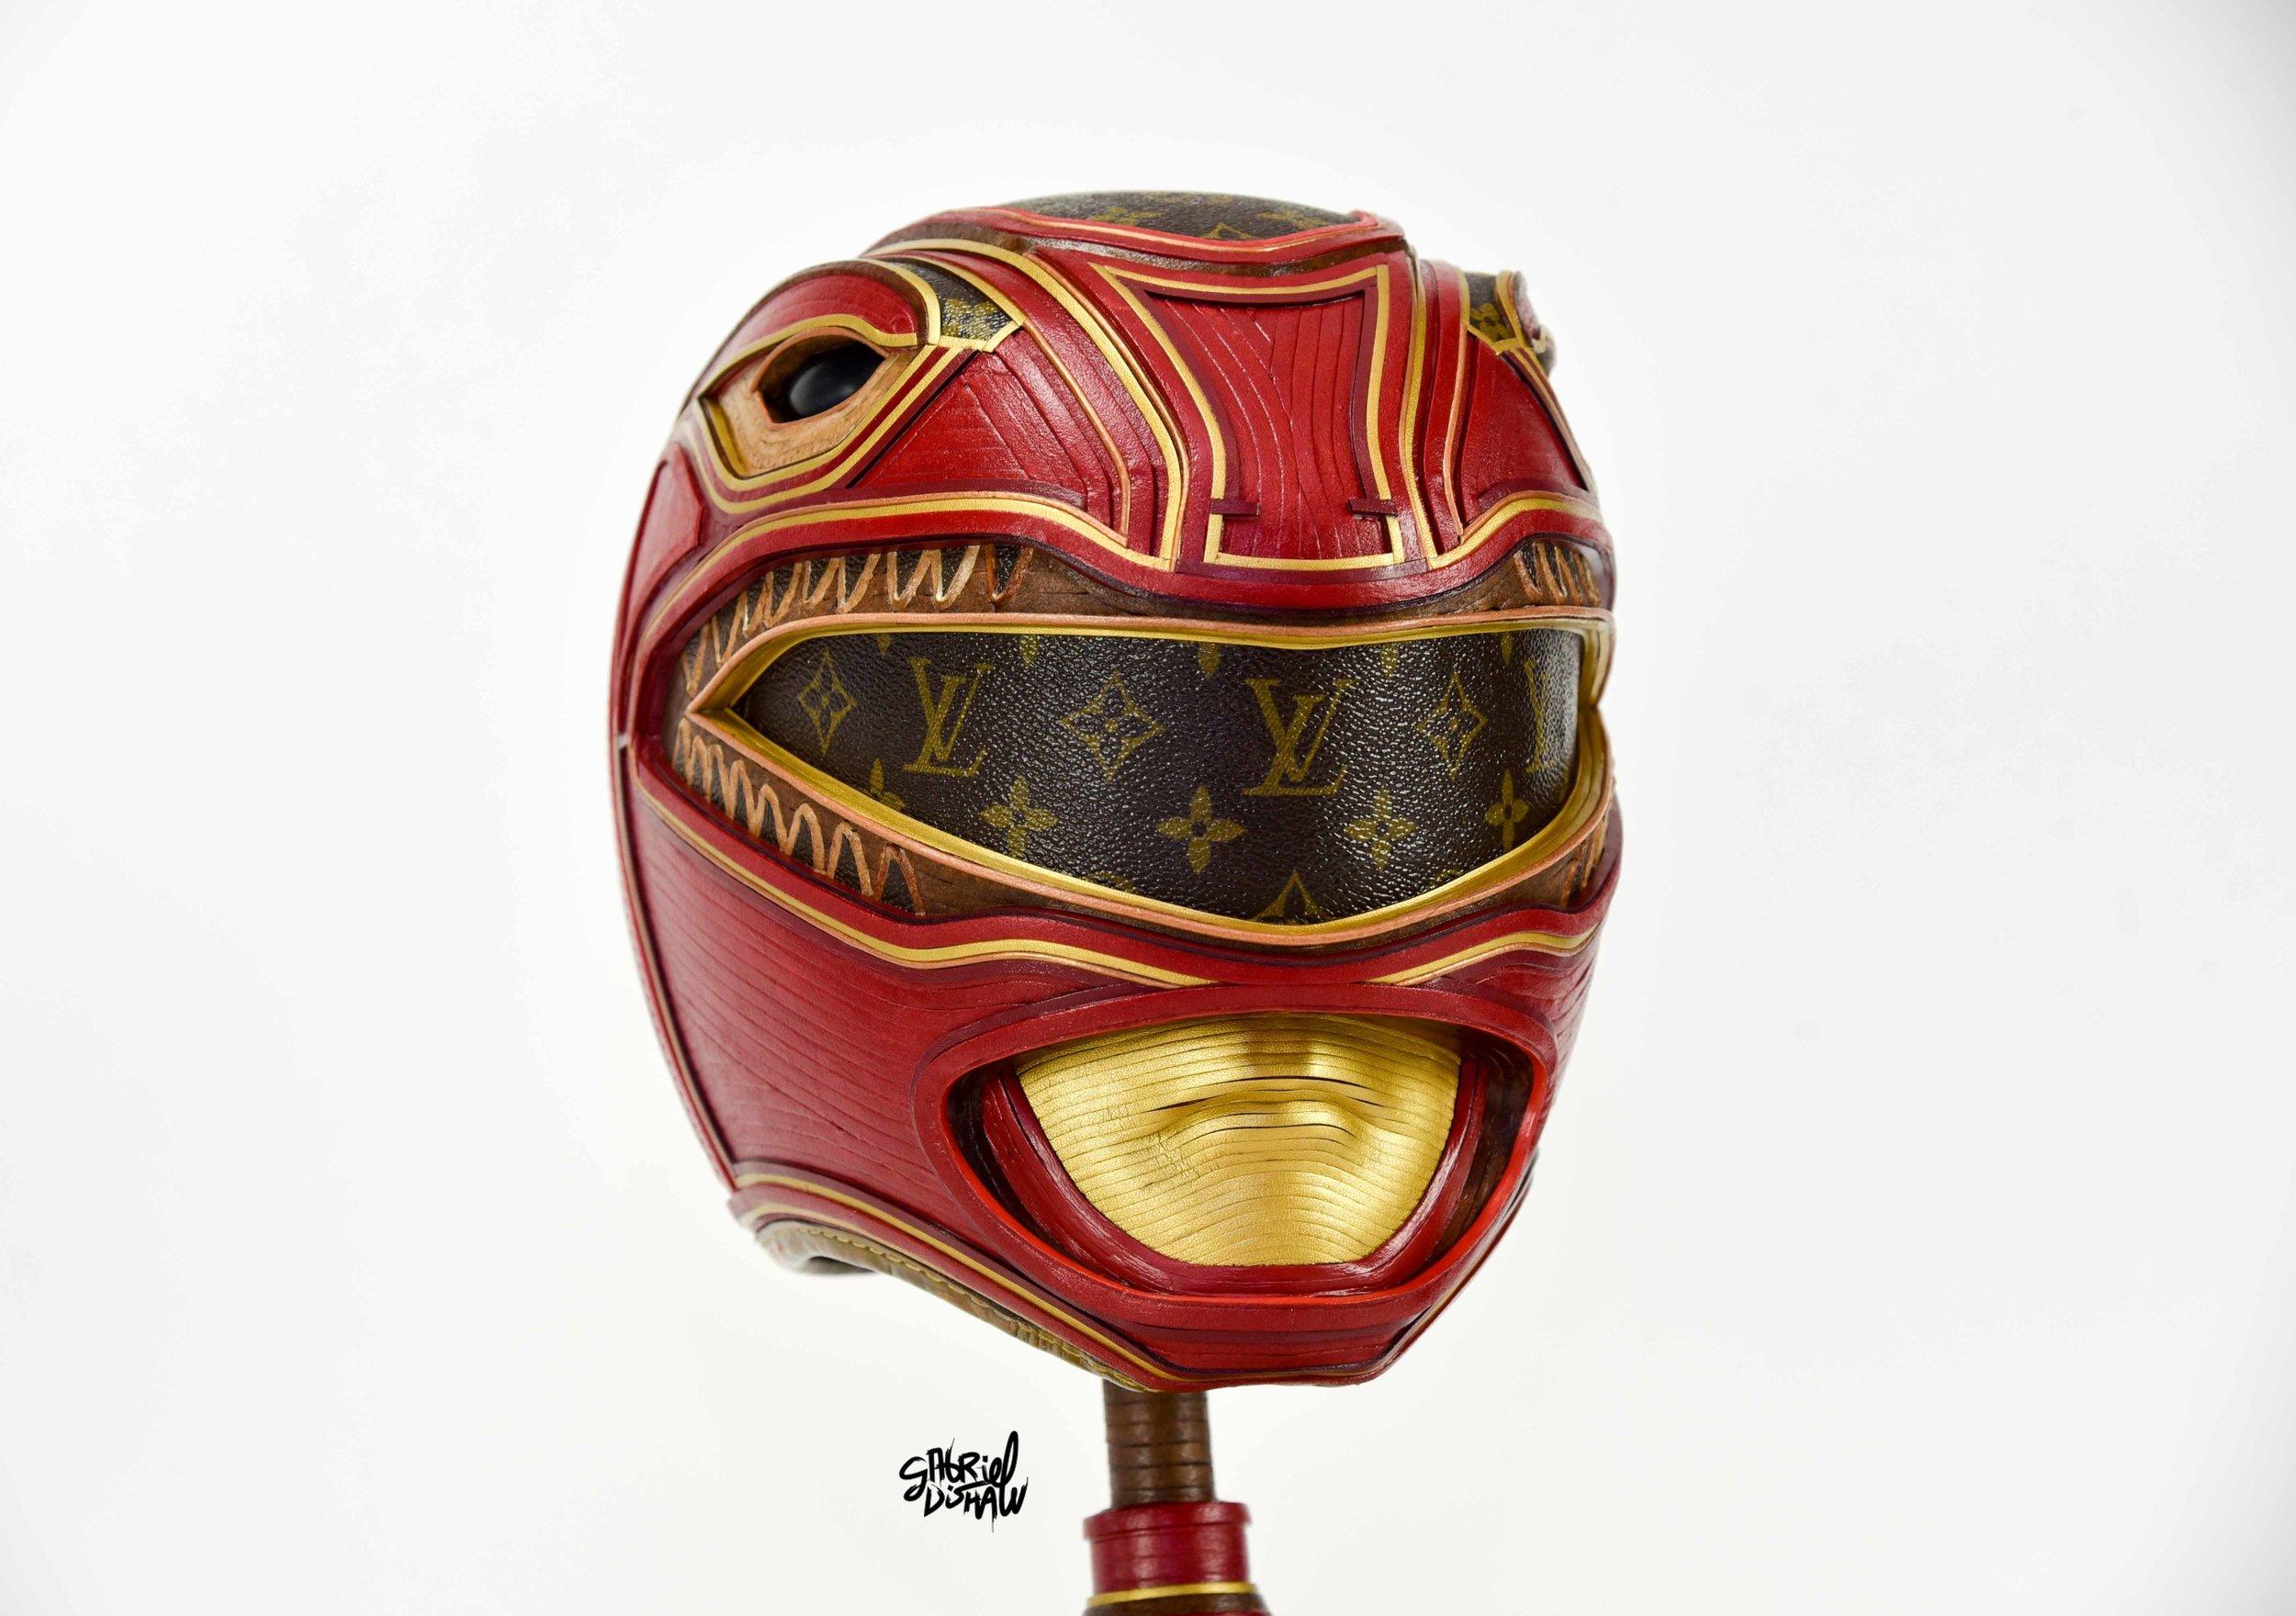 Gabriel Dishaw LV Red Ranger-3213.jpg